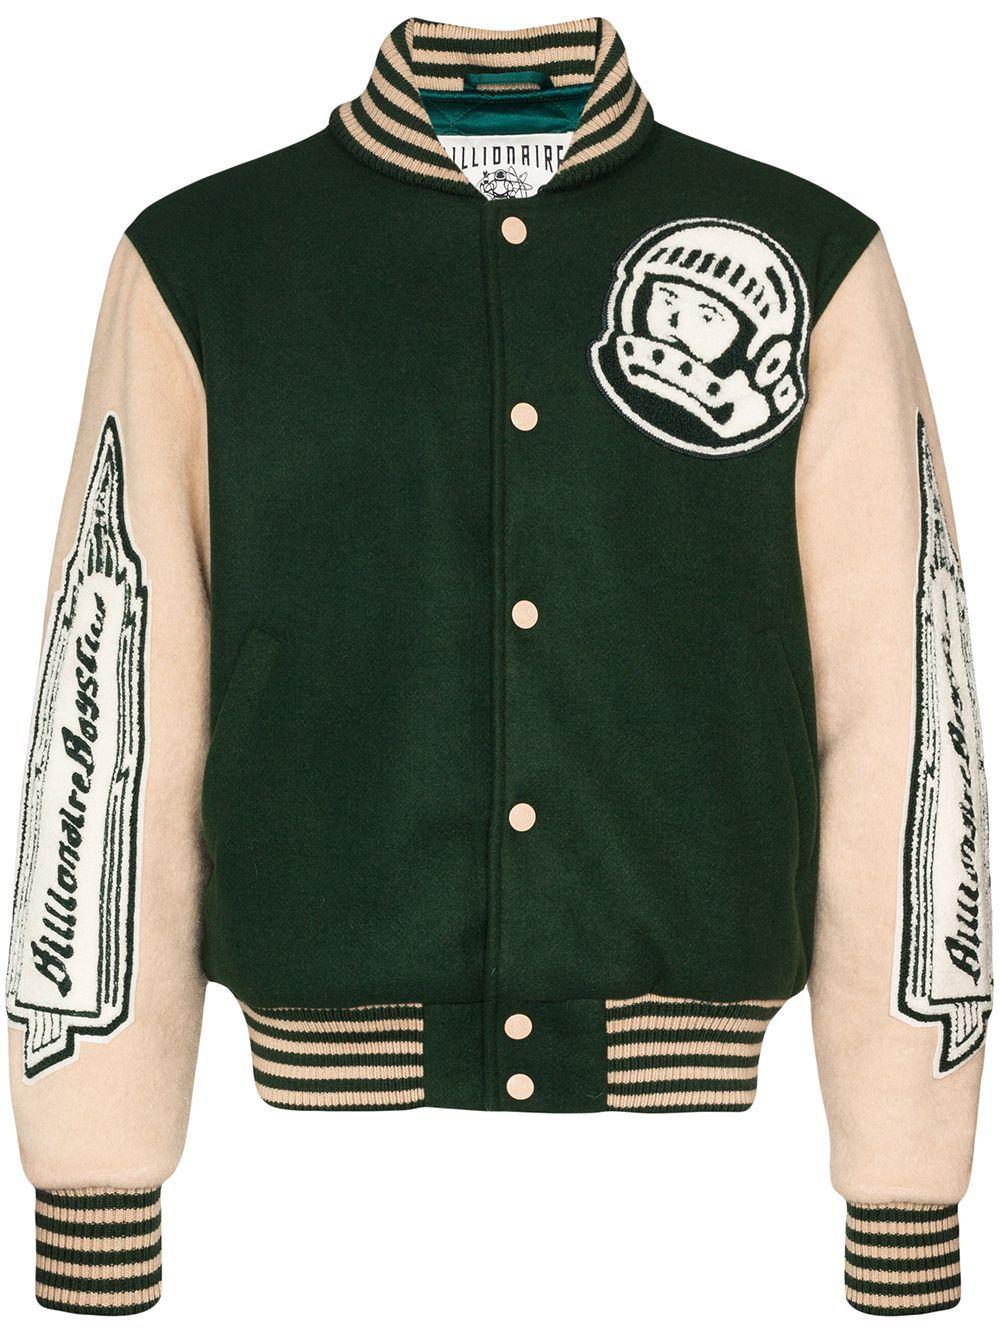 Billionaire Boys Club Astro Varsity Bomber Jacket Farfetch Designer Jackets For Men Varsity Jacket Men Varsity Bomber Jacket [ 1334 x 1000 Pixel ]